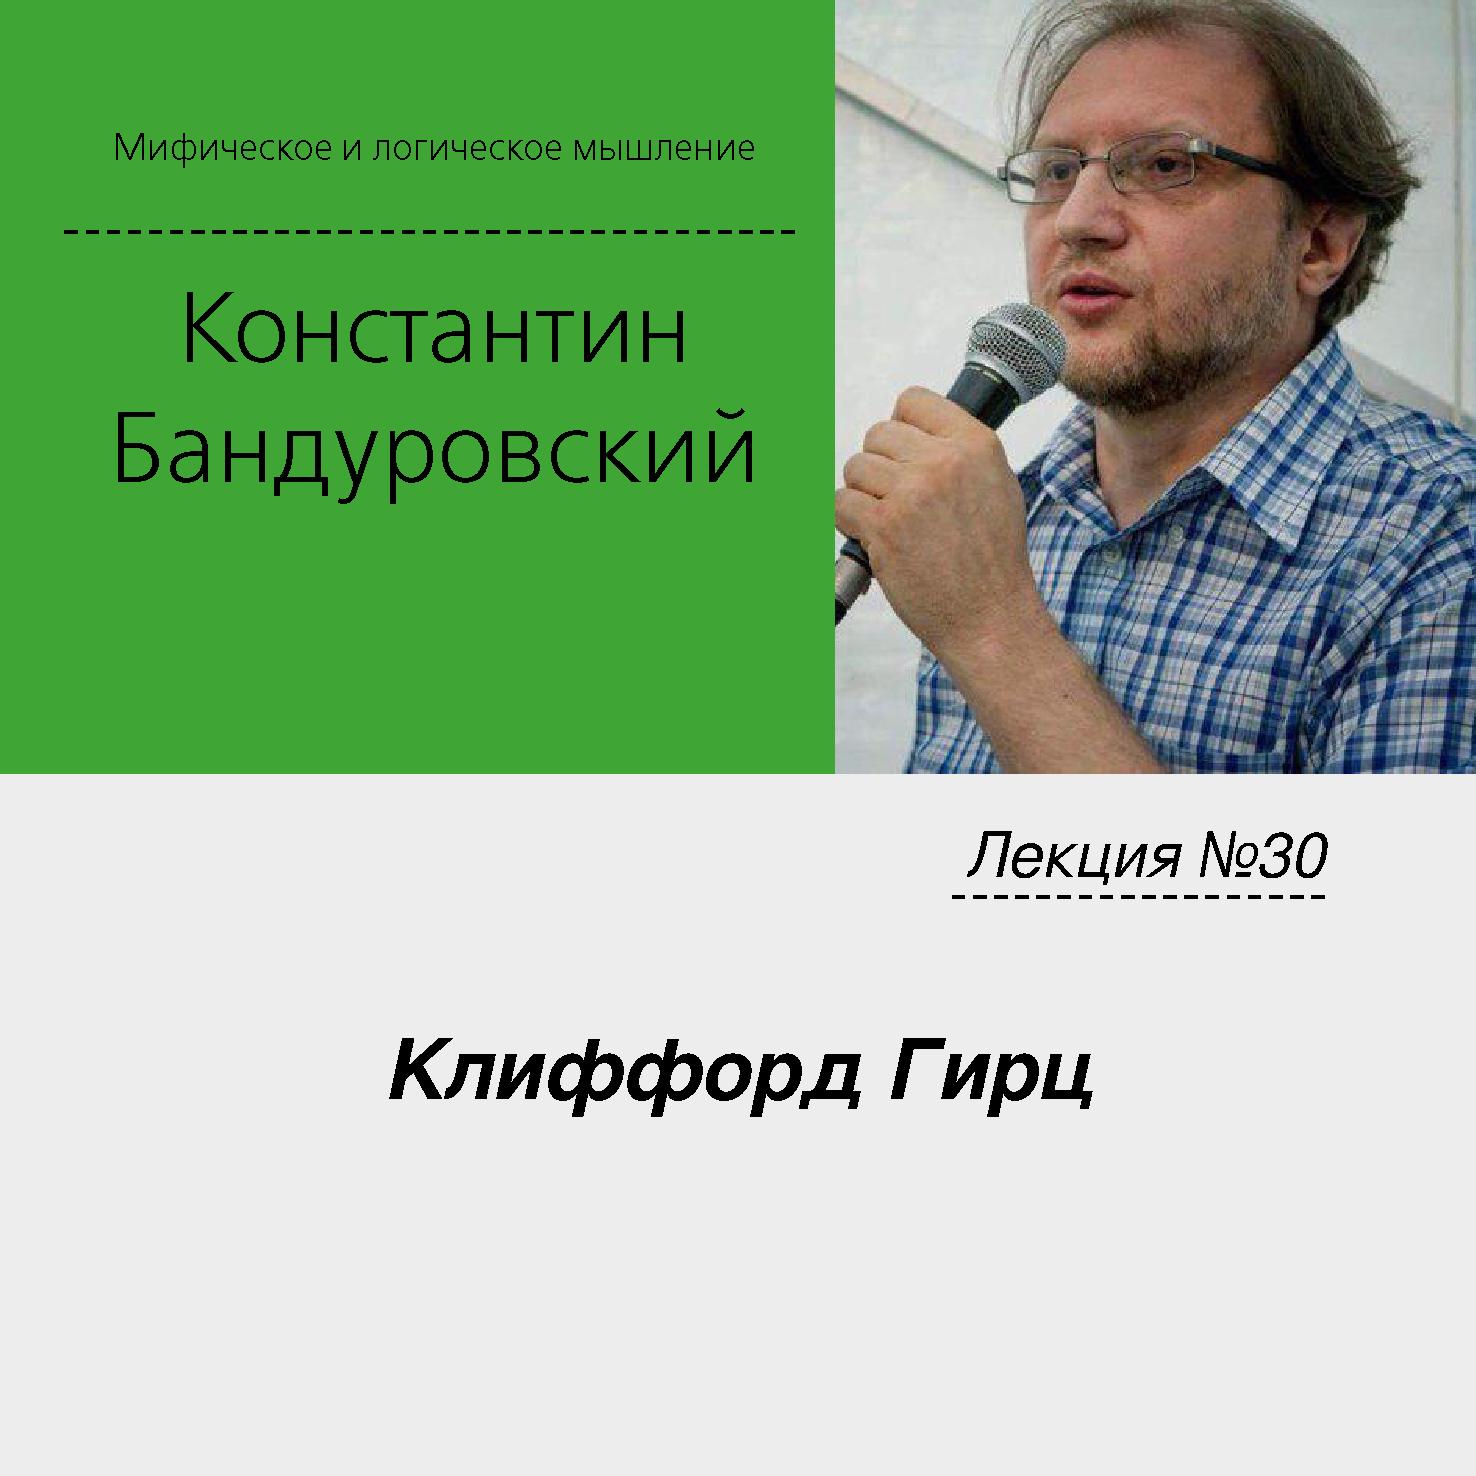 Константин Бандуровский Лекция №30 «Клиффорд Гирц» константин бандуровский лекция 1 сложности изучения мифа